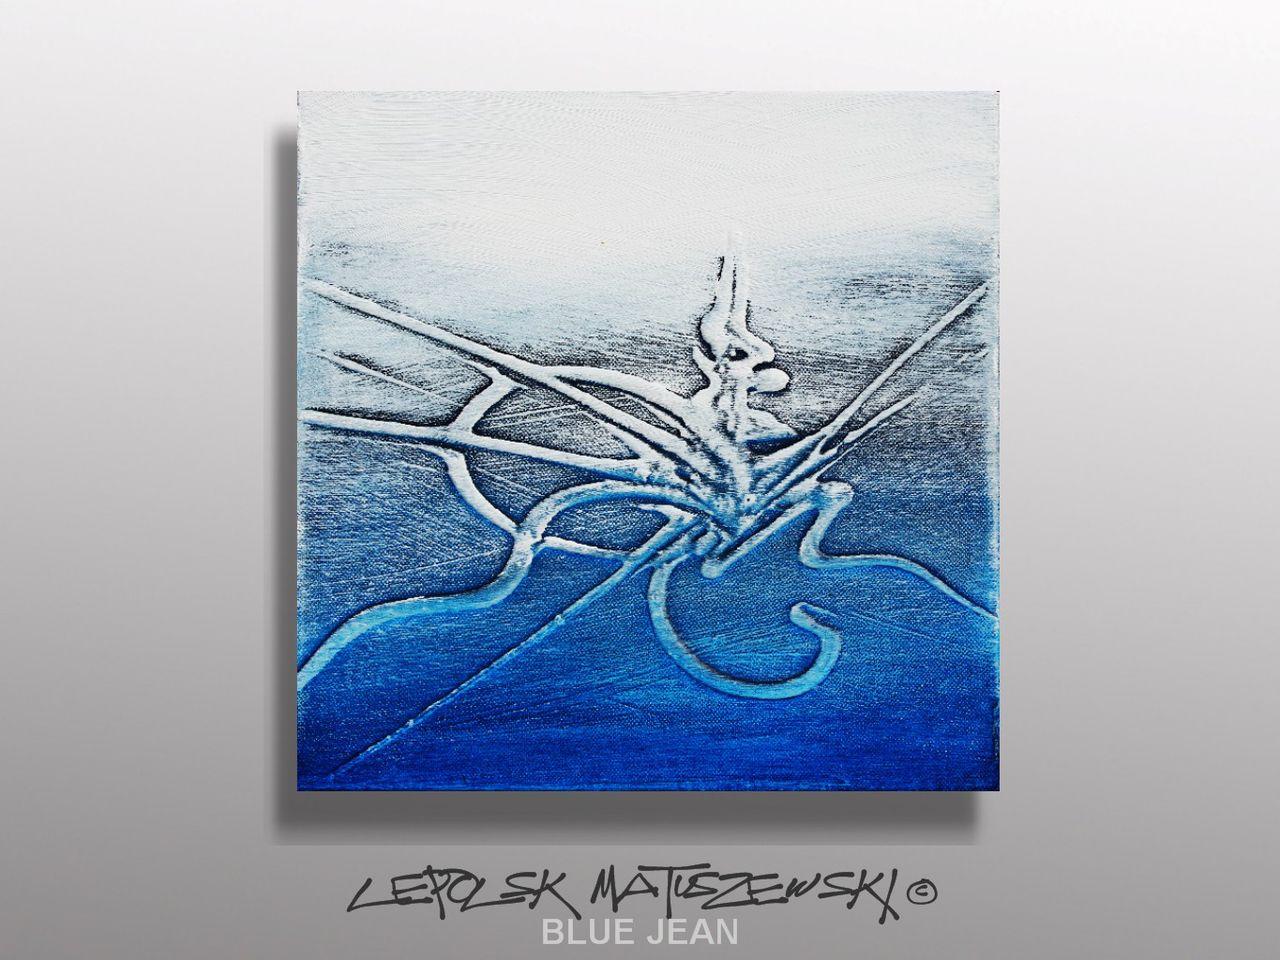 MK  Lepolsk Matuszewski BLUE JEAN